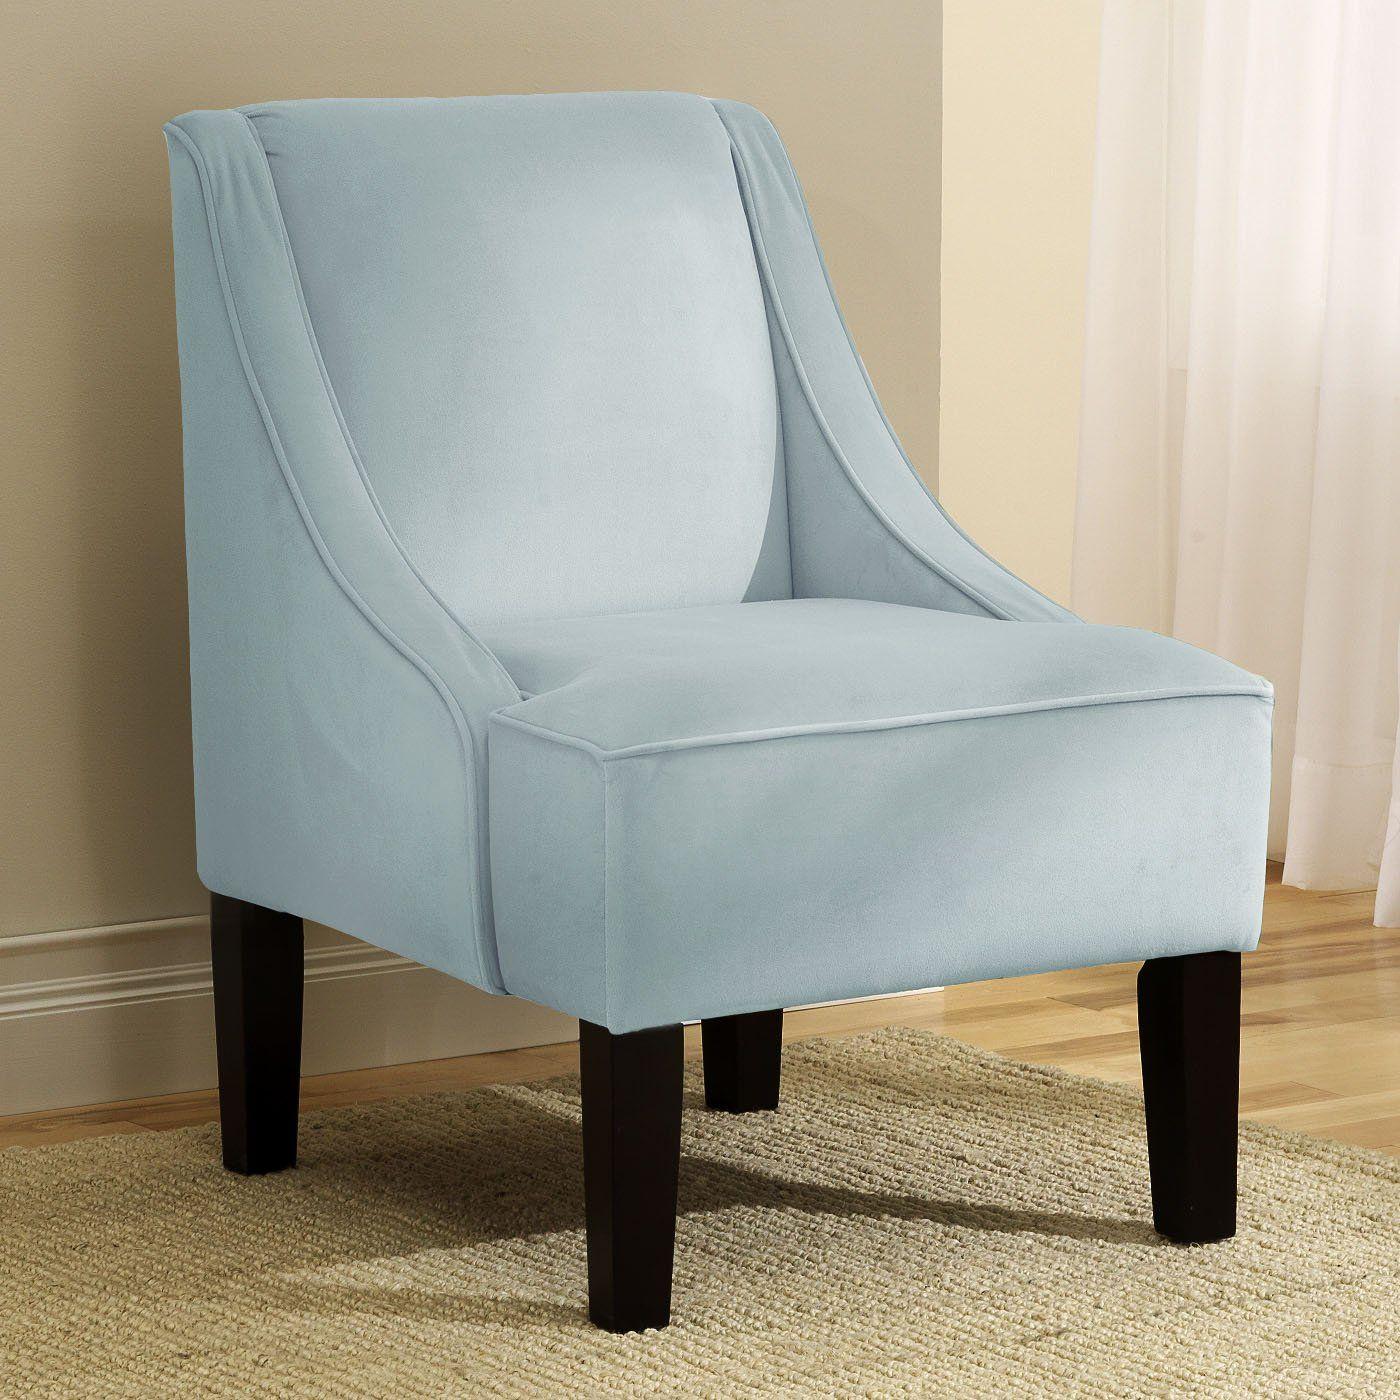 Skyline Furniture 72 1 Swoop Arm Accent Chair Pool Velvet $238